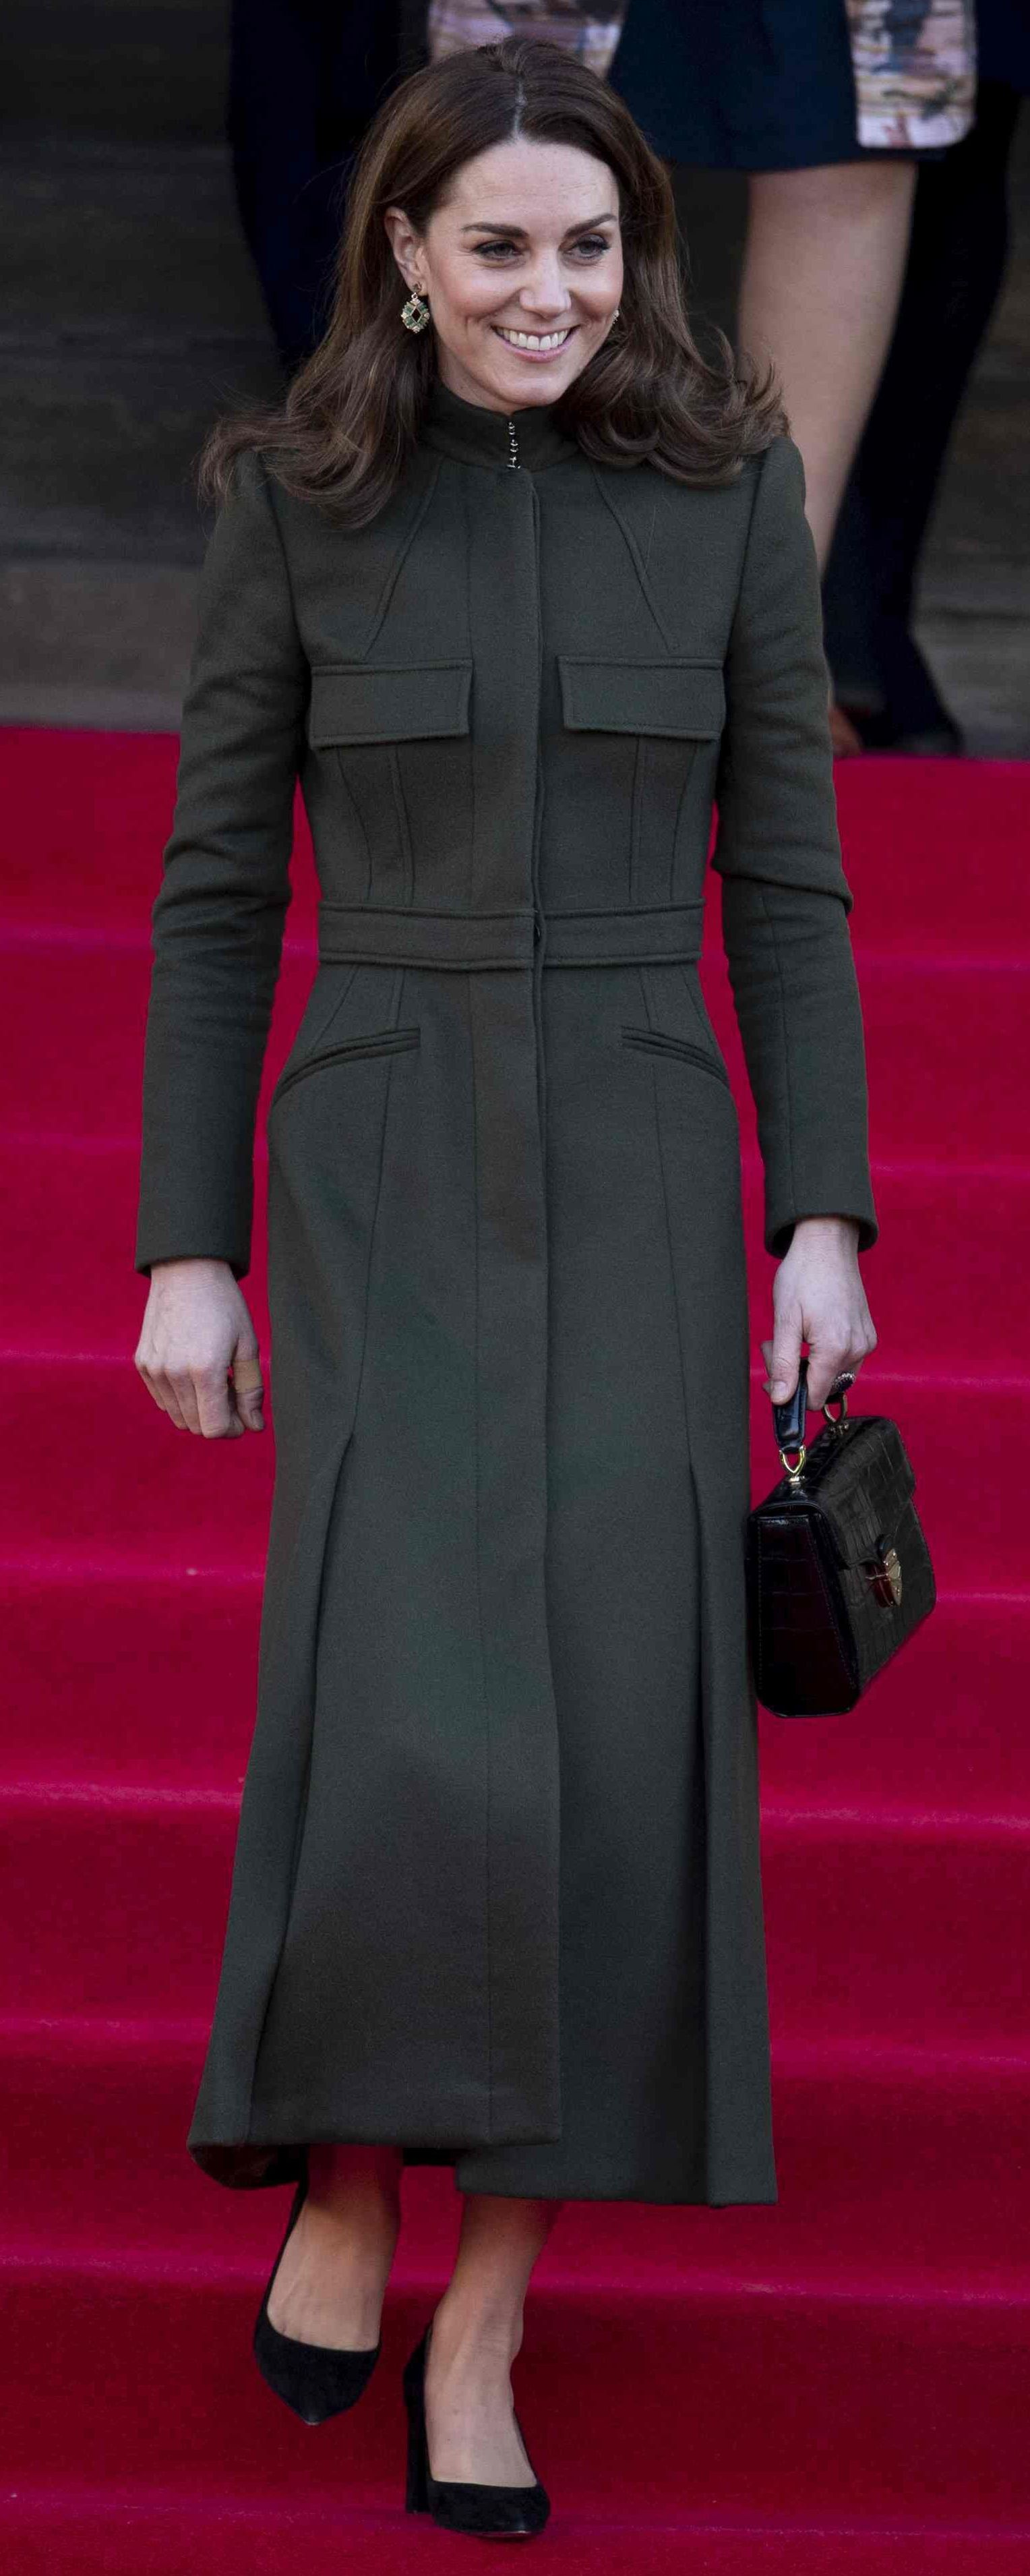 131 Best Kate Middleton Coats & Jackets images in 2020